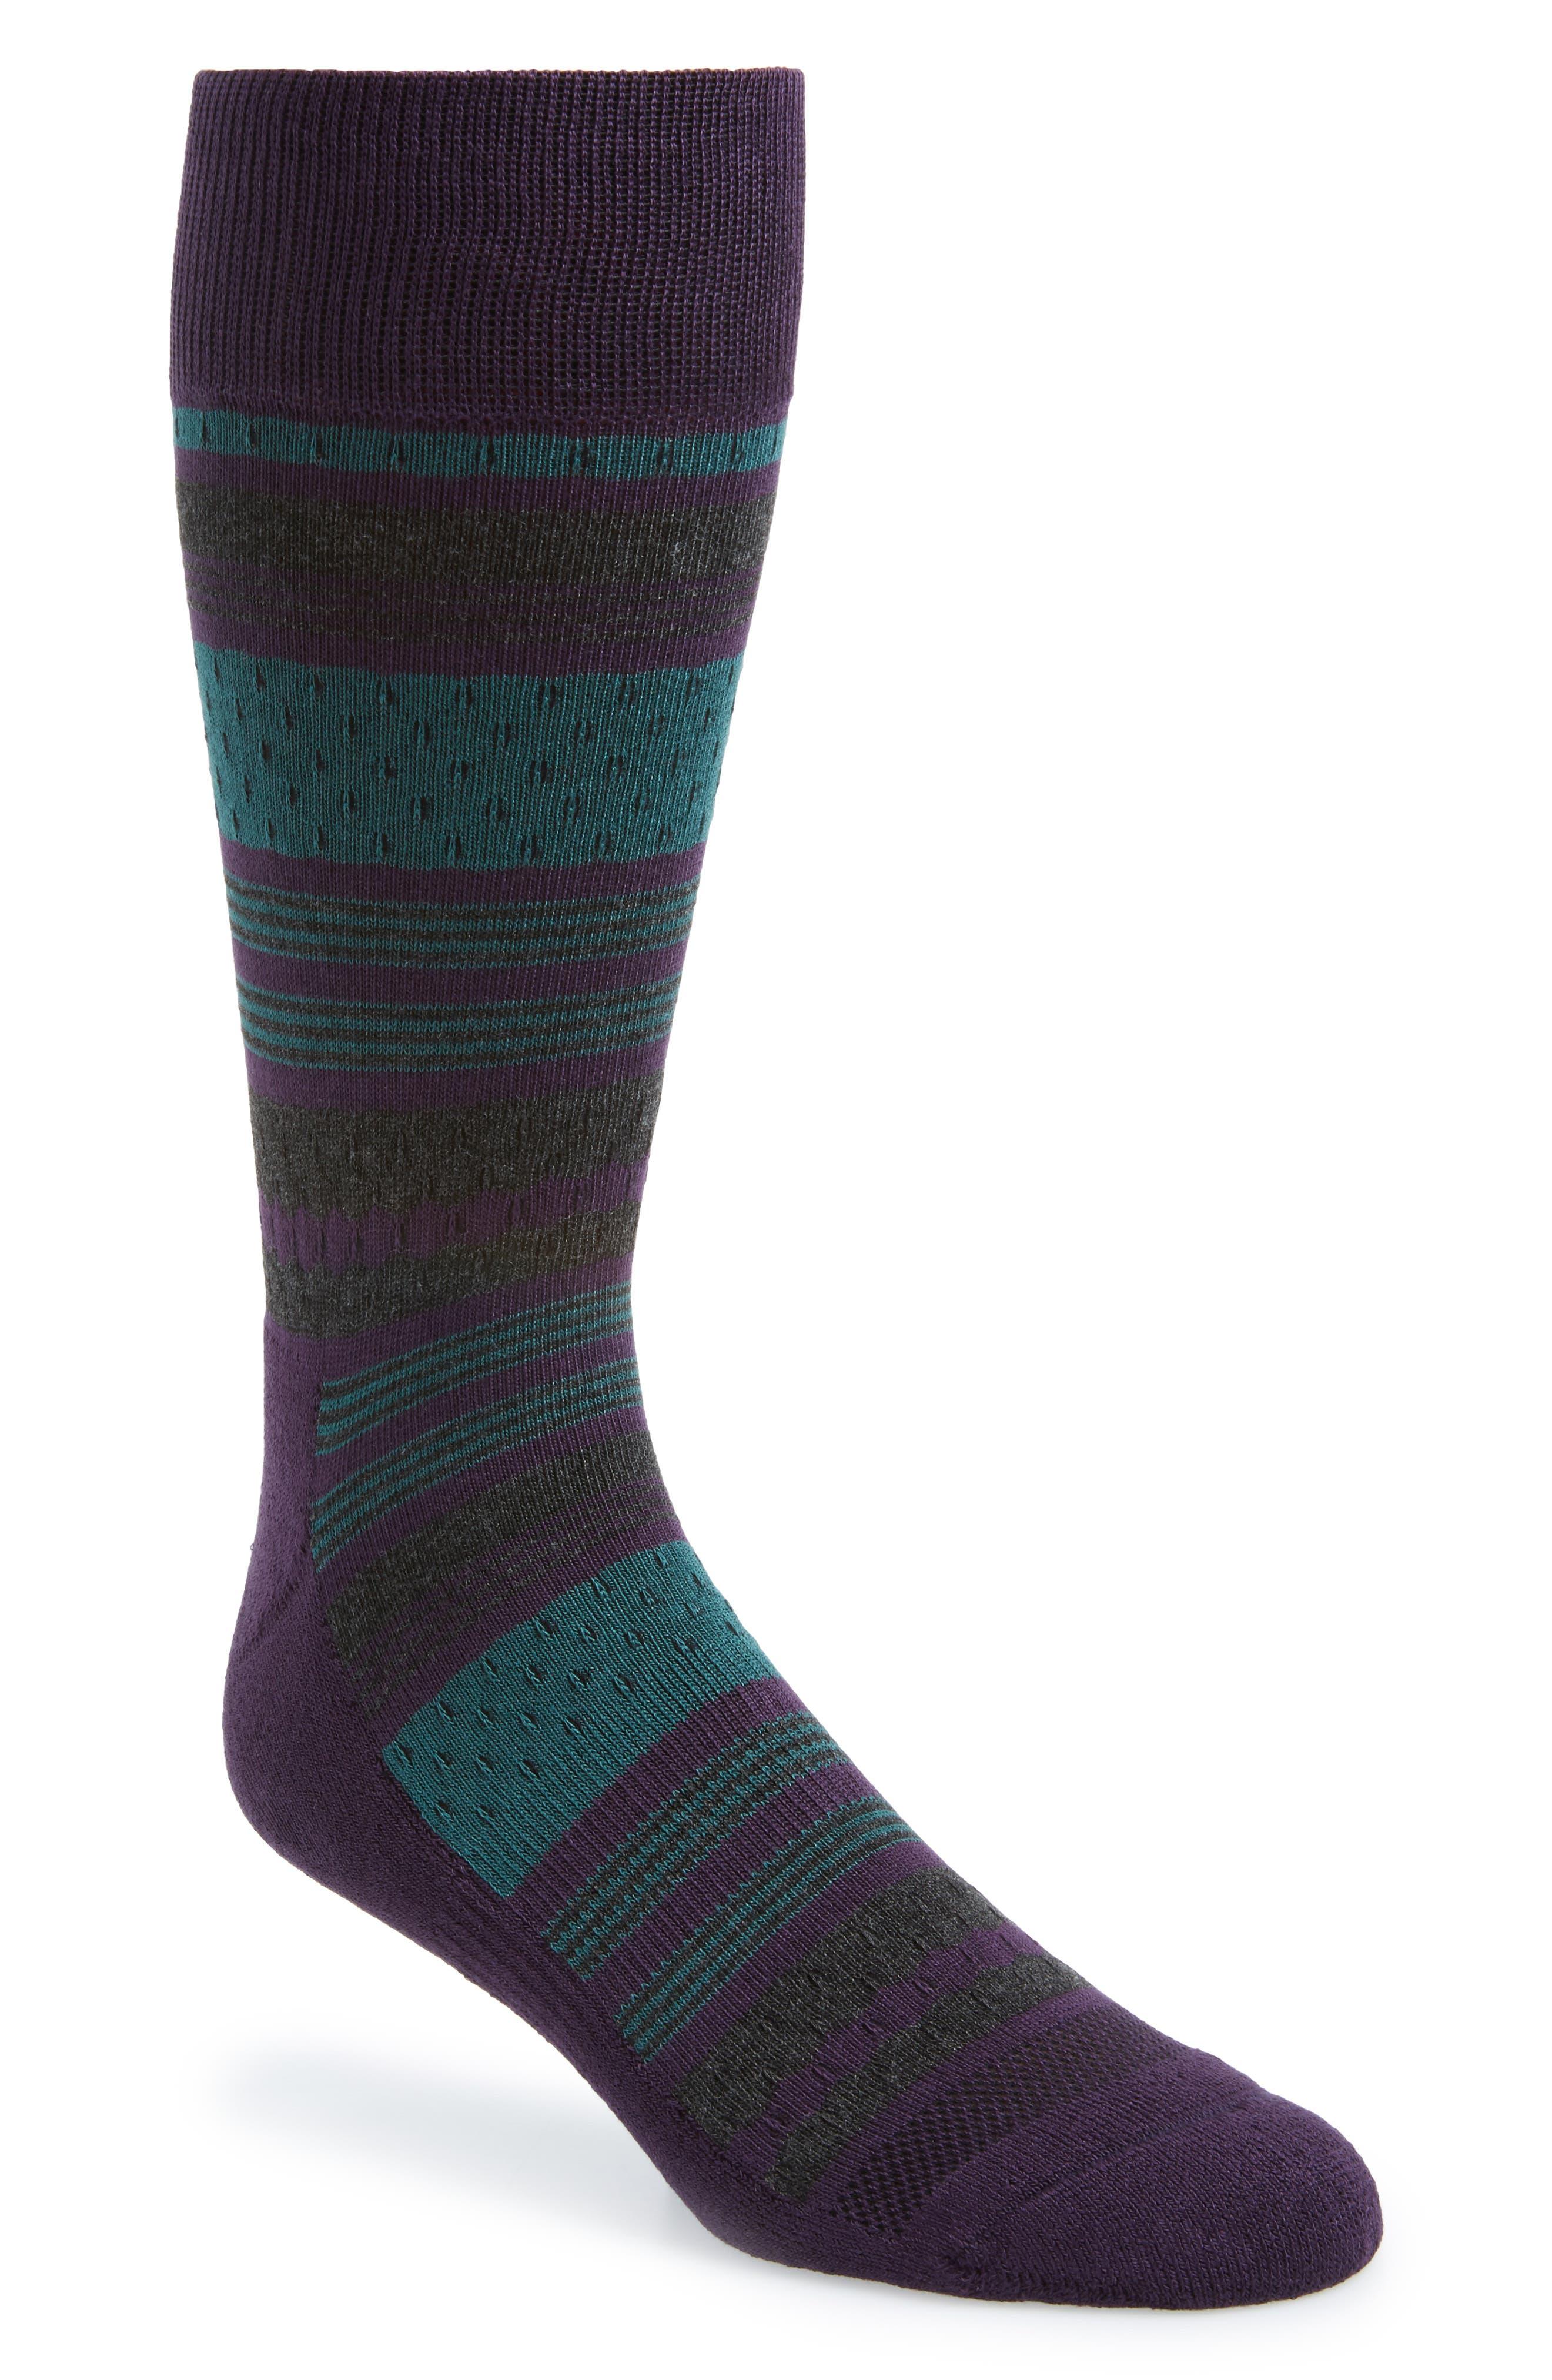 Stripe Socks,                         Main,                         color, PURPLE/ CHARCOAL